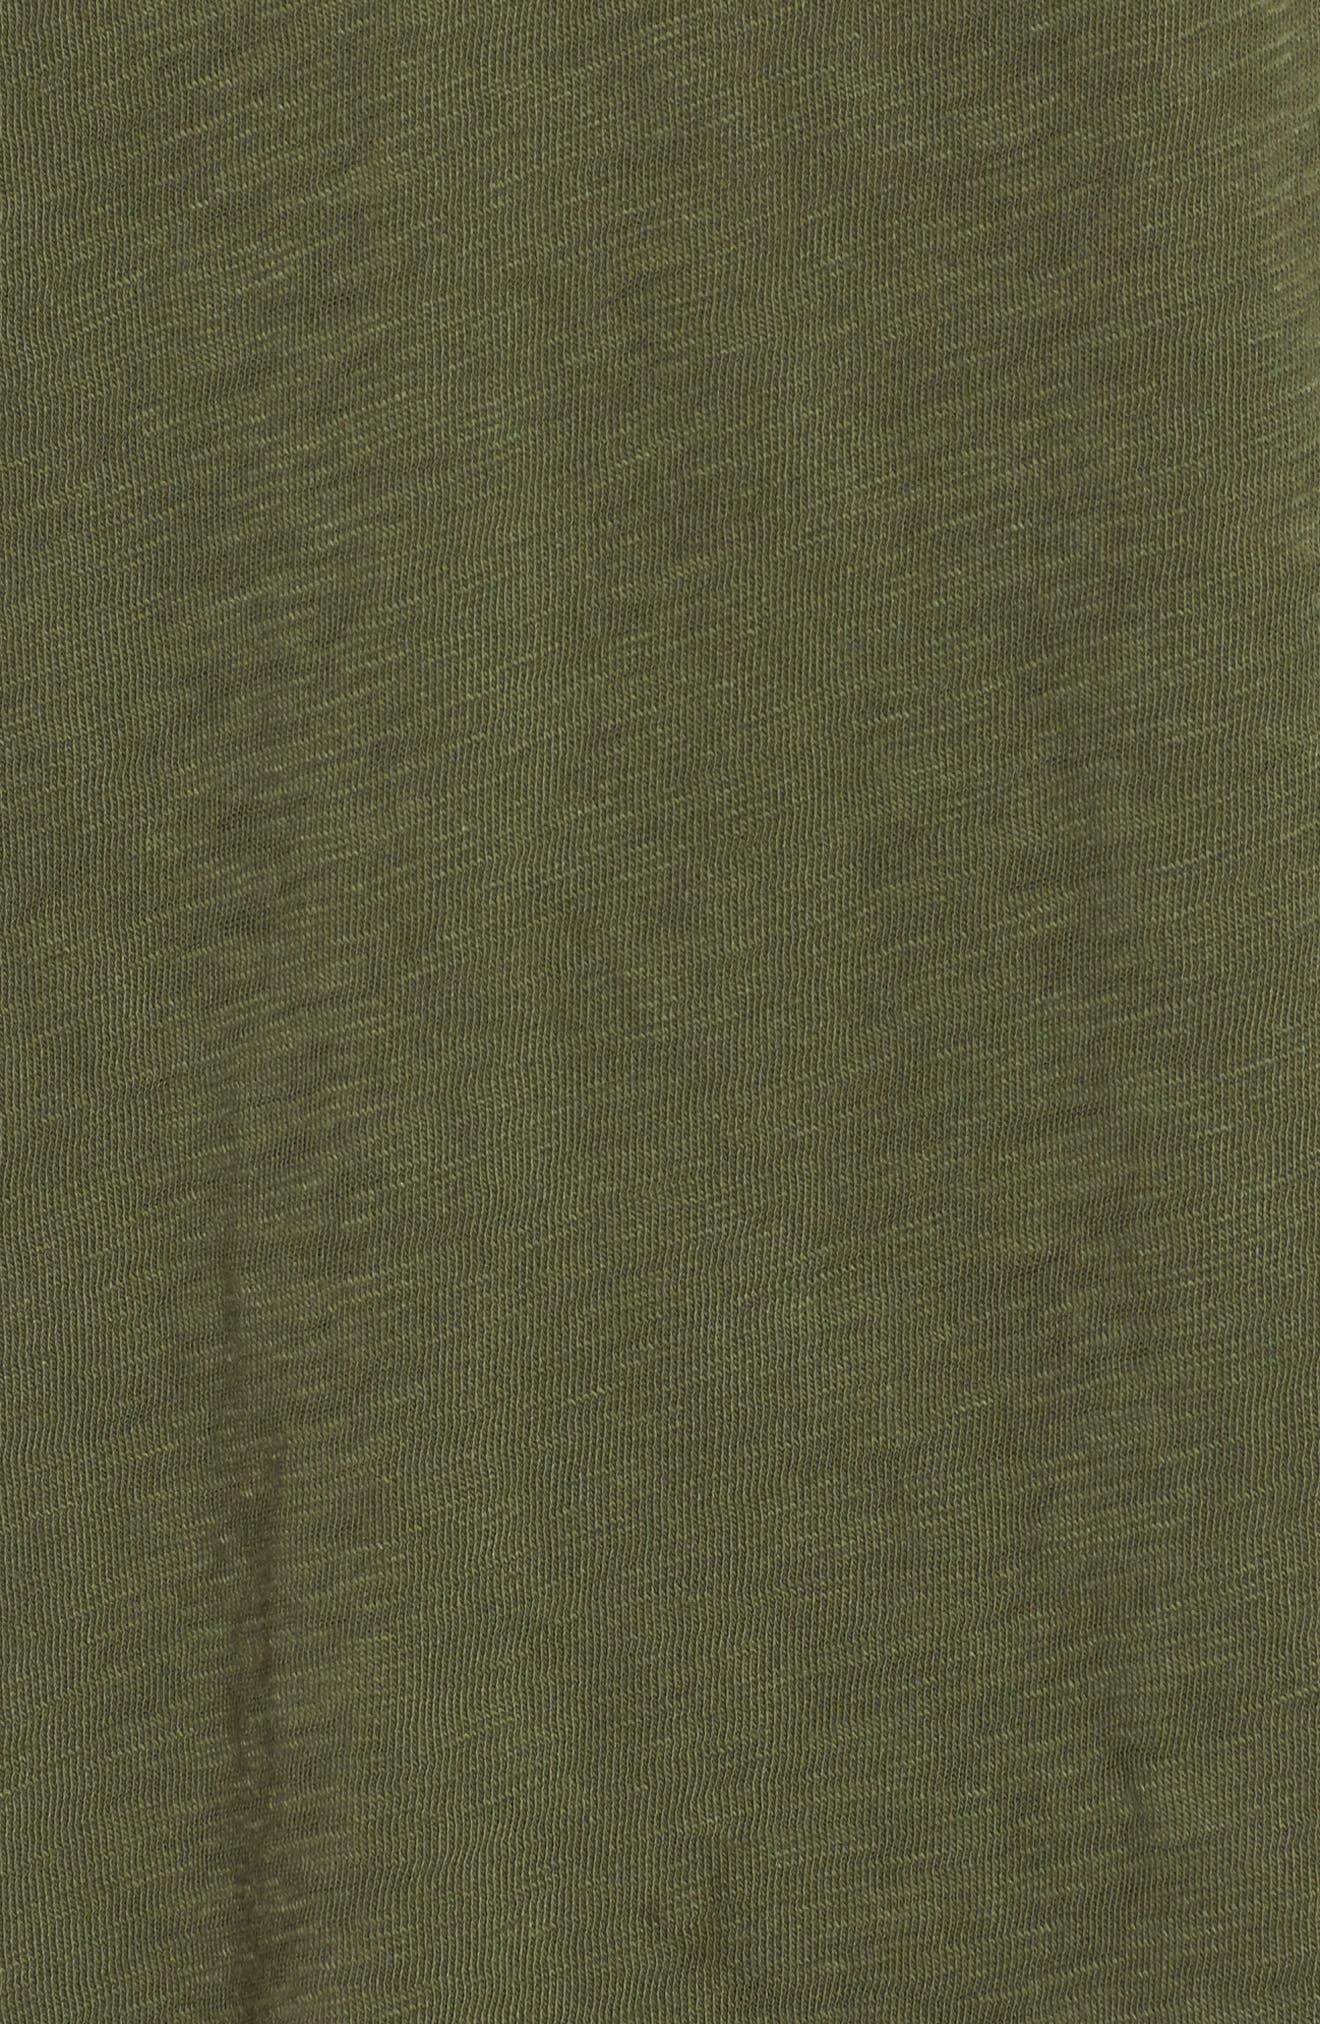 Long Sleeve Henley T-Shirt,                             Alternate thumbnail 5, color,                             Olive